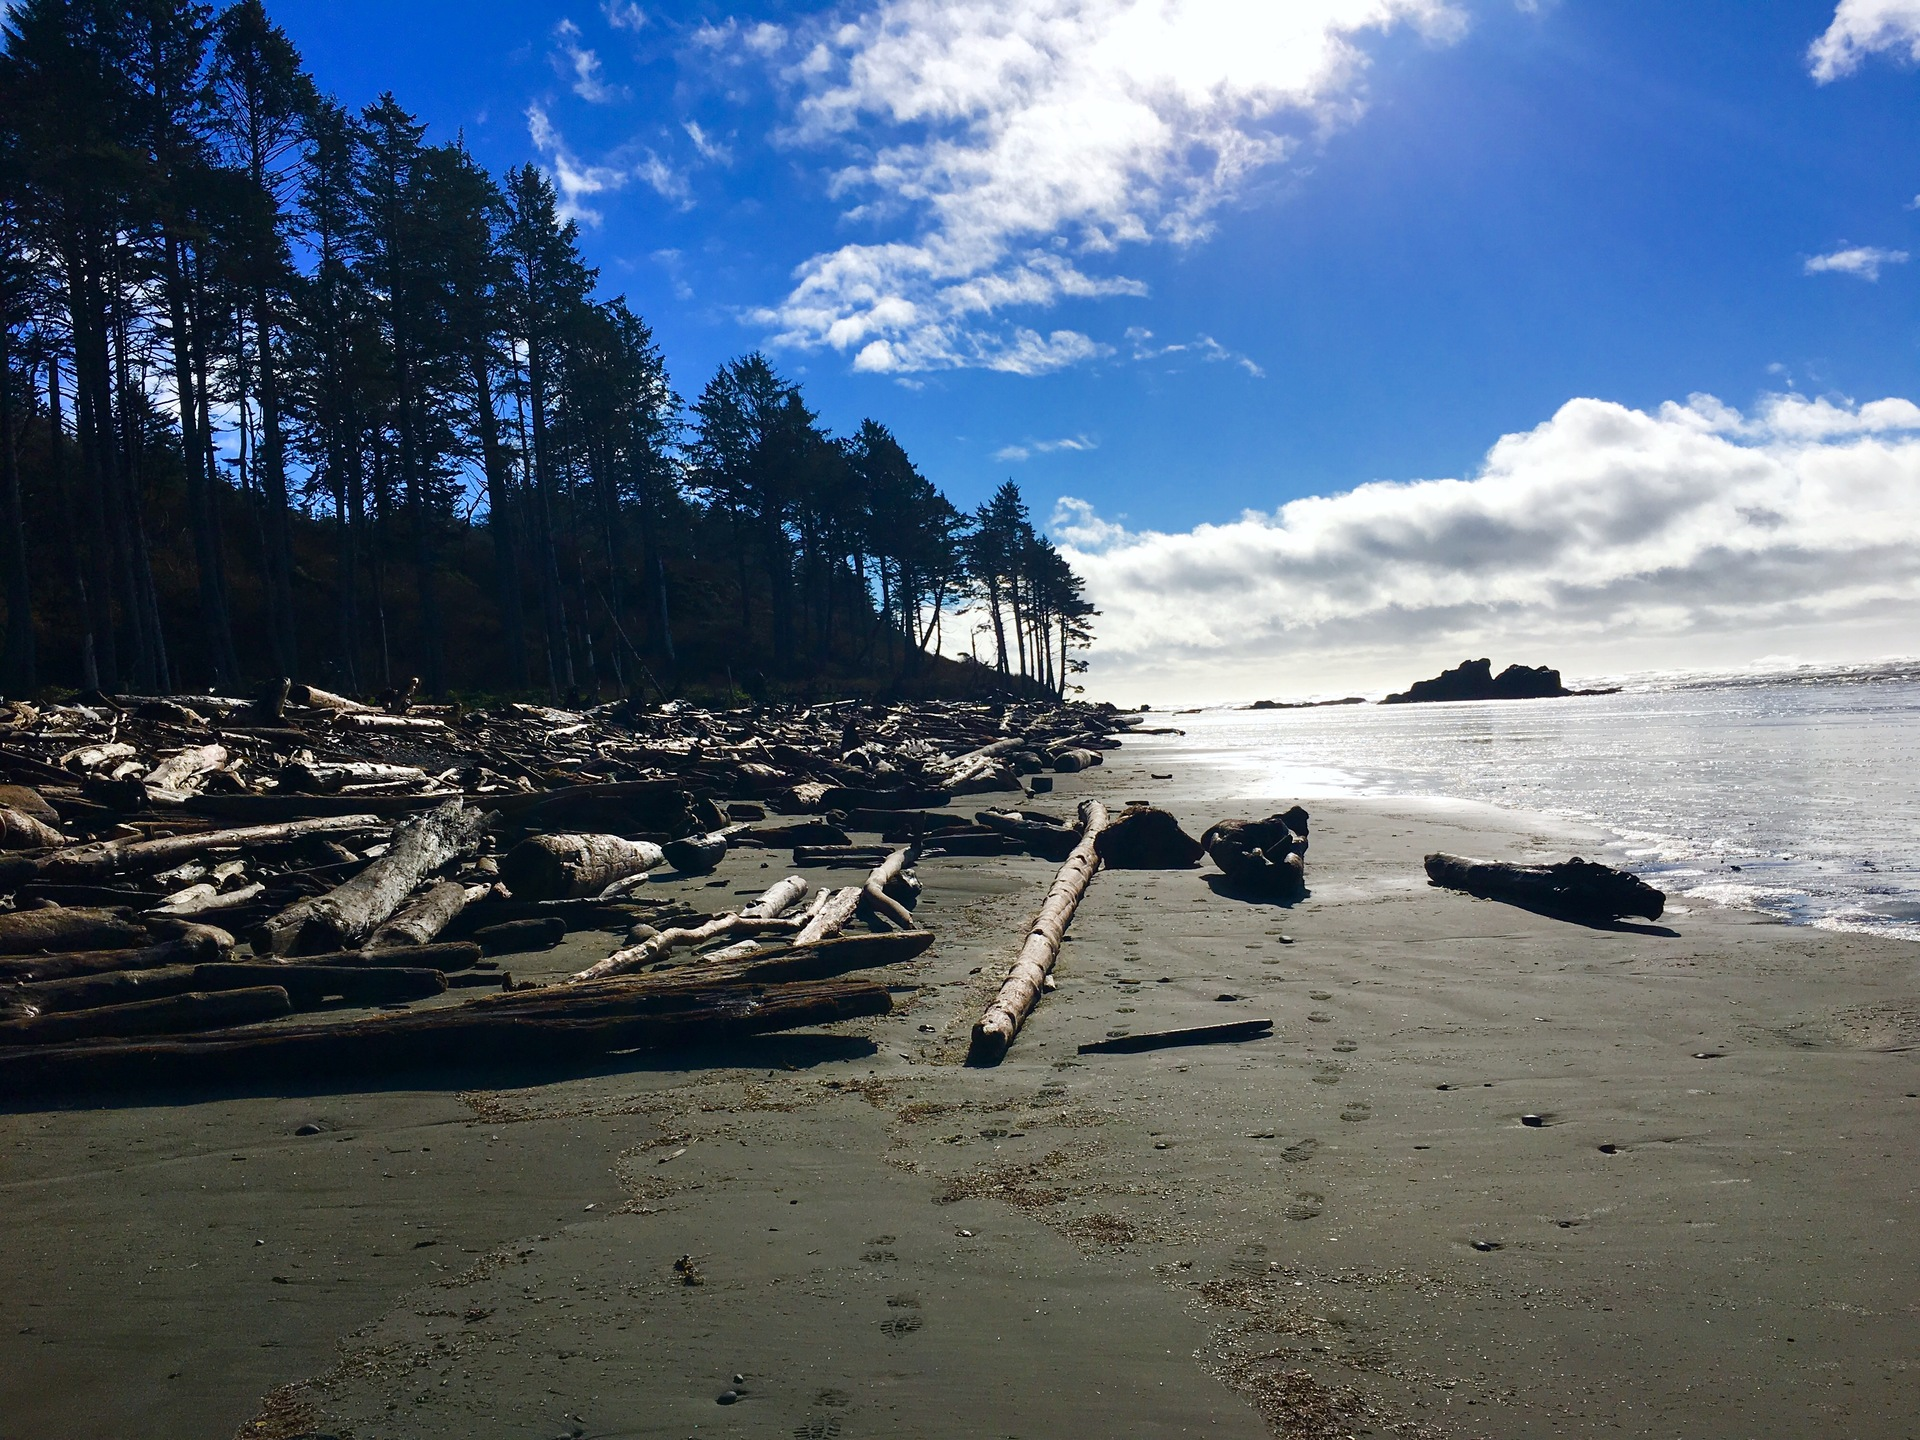 Ruby Beach, Pacific Ocean, Olympic Peninsula, Washington State